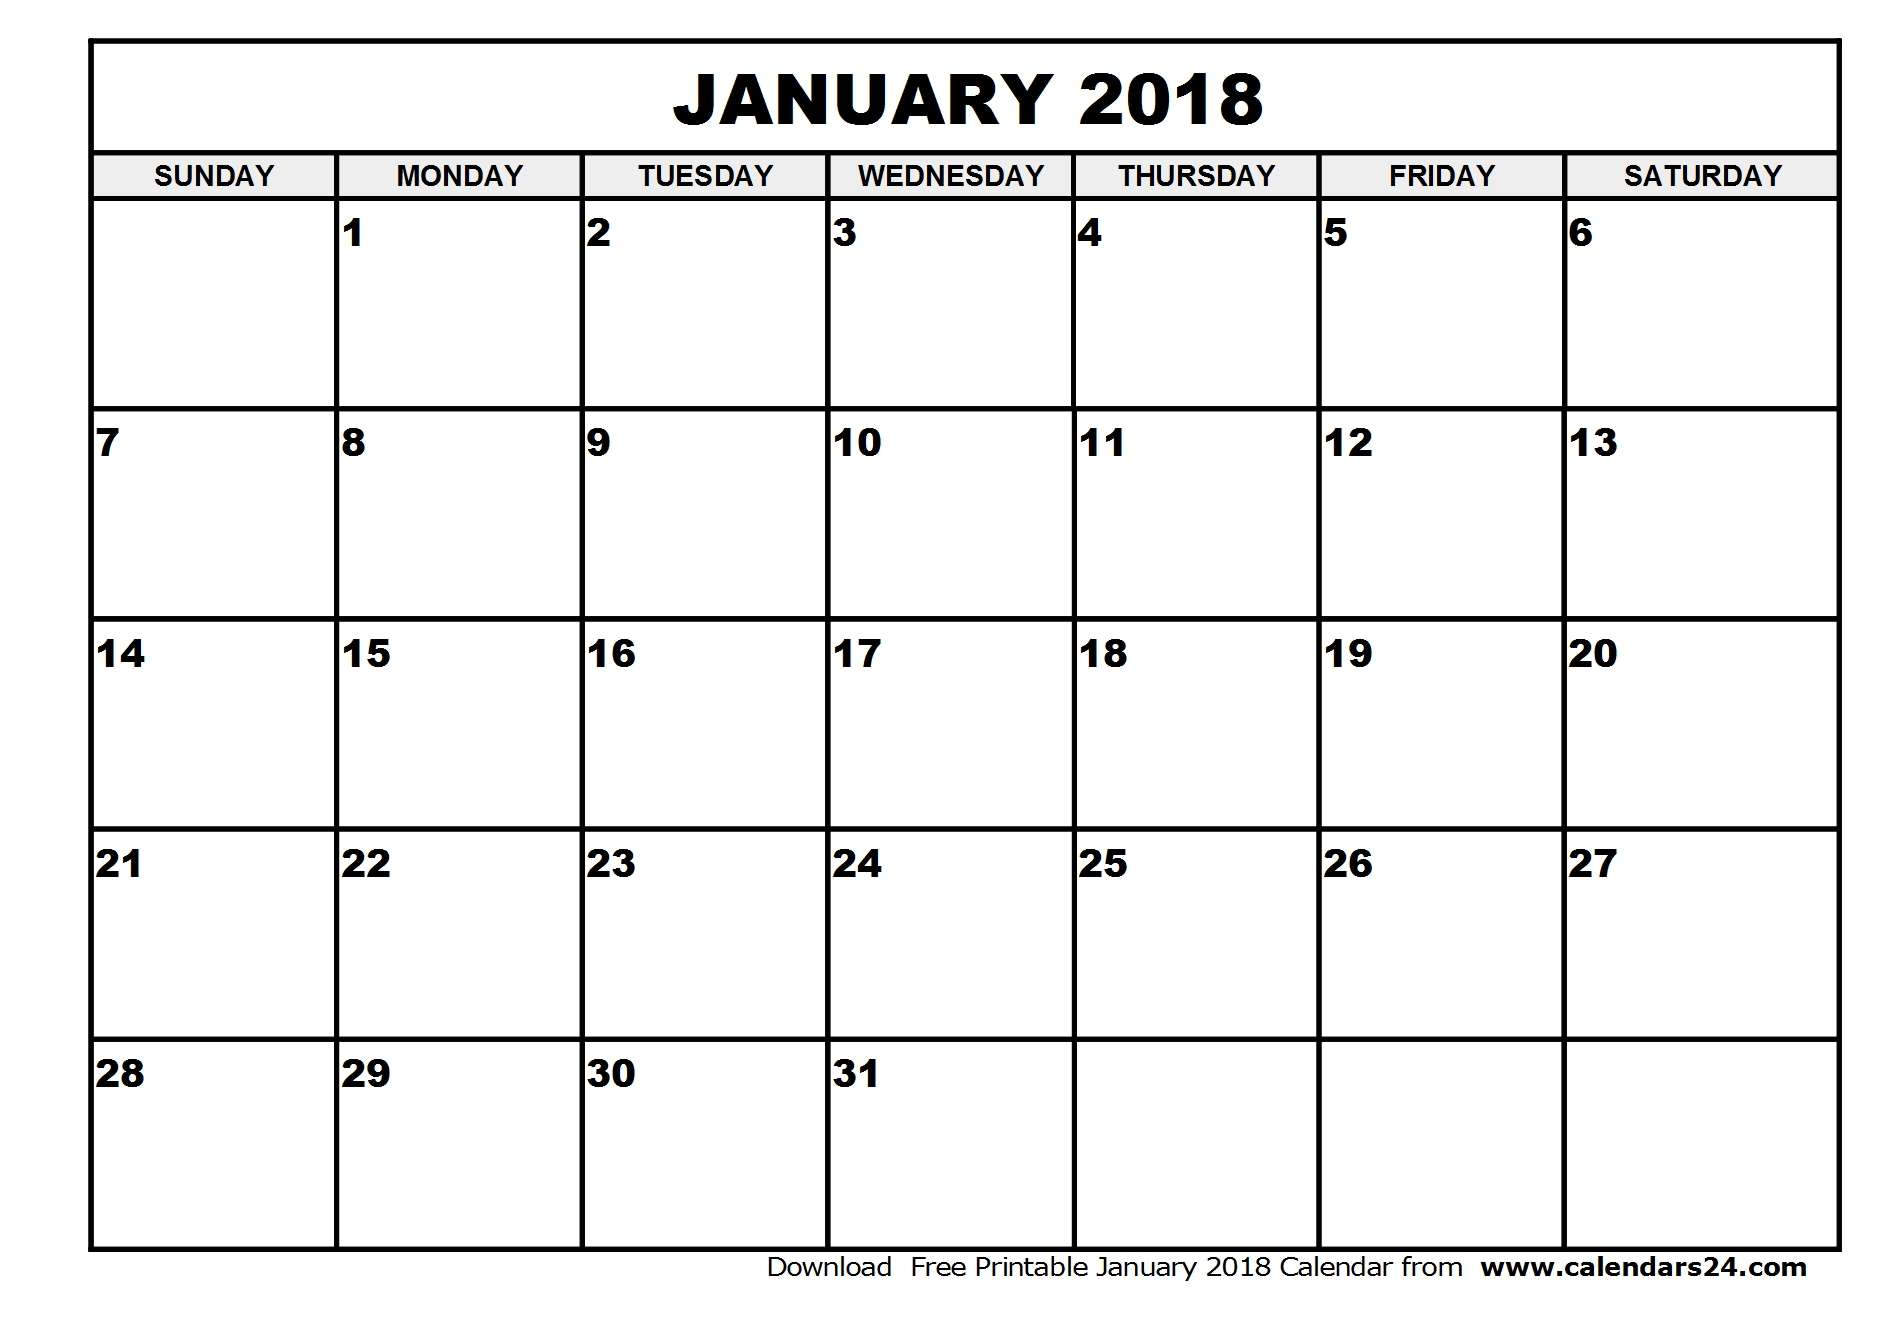 January 2018 Calendar & February 2018 Calendar